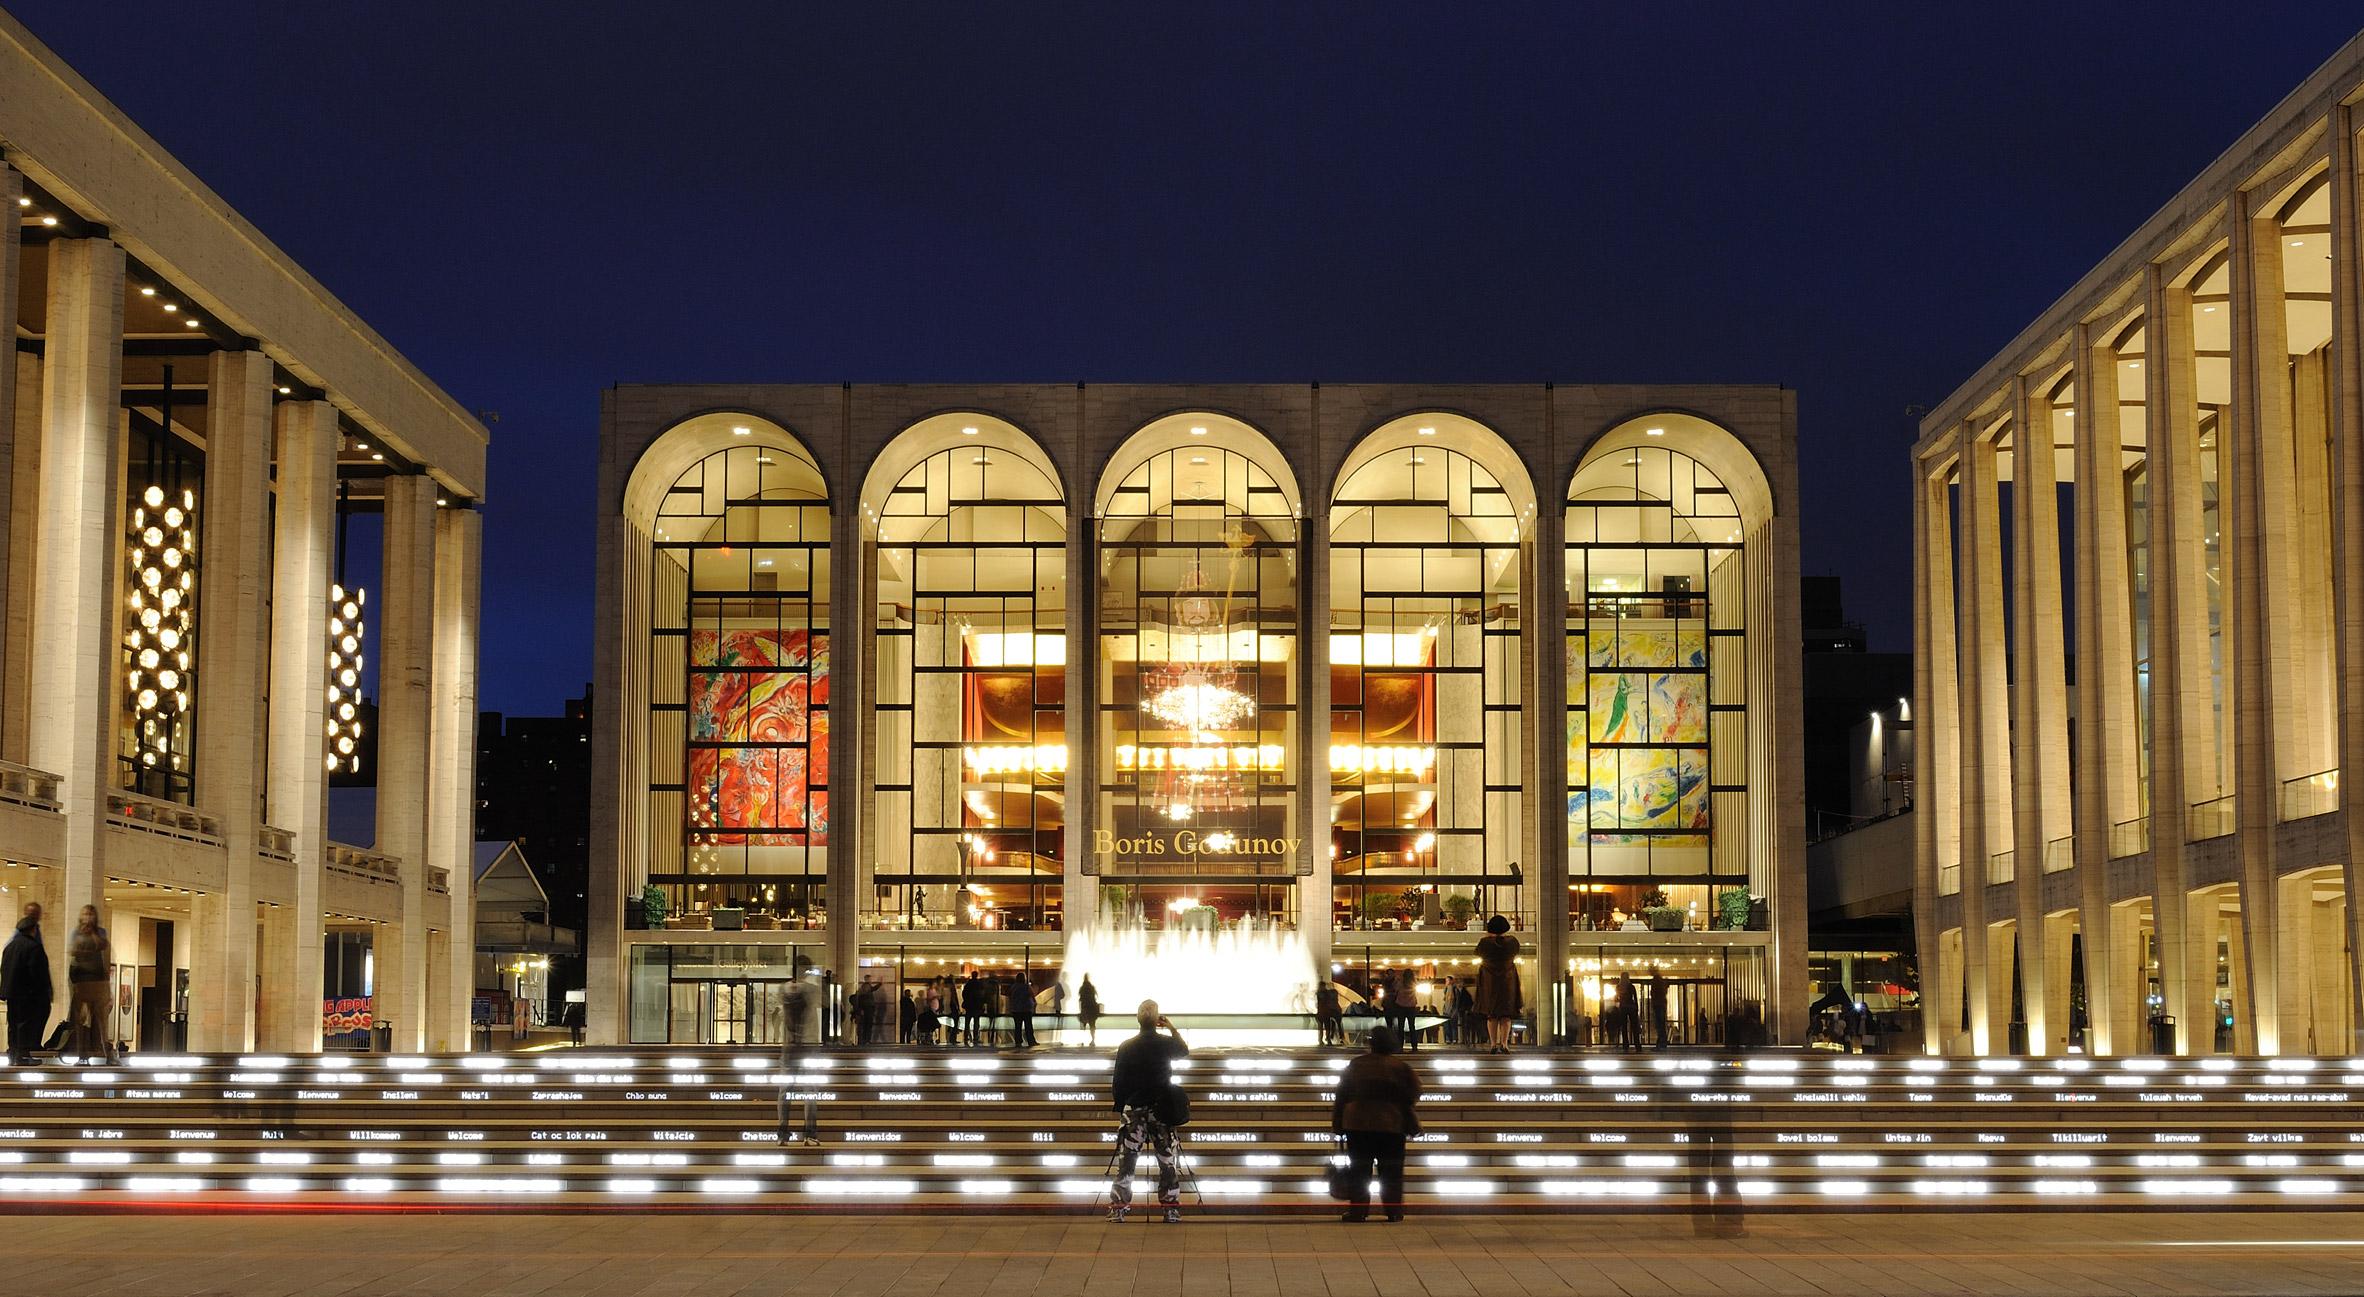 Lincoln Center, New York